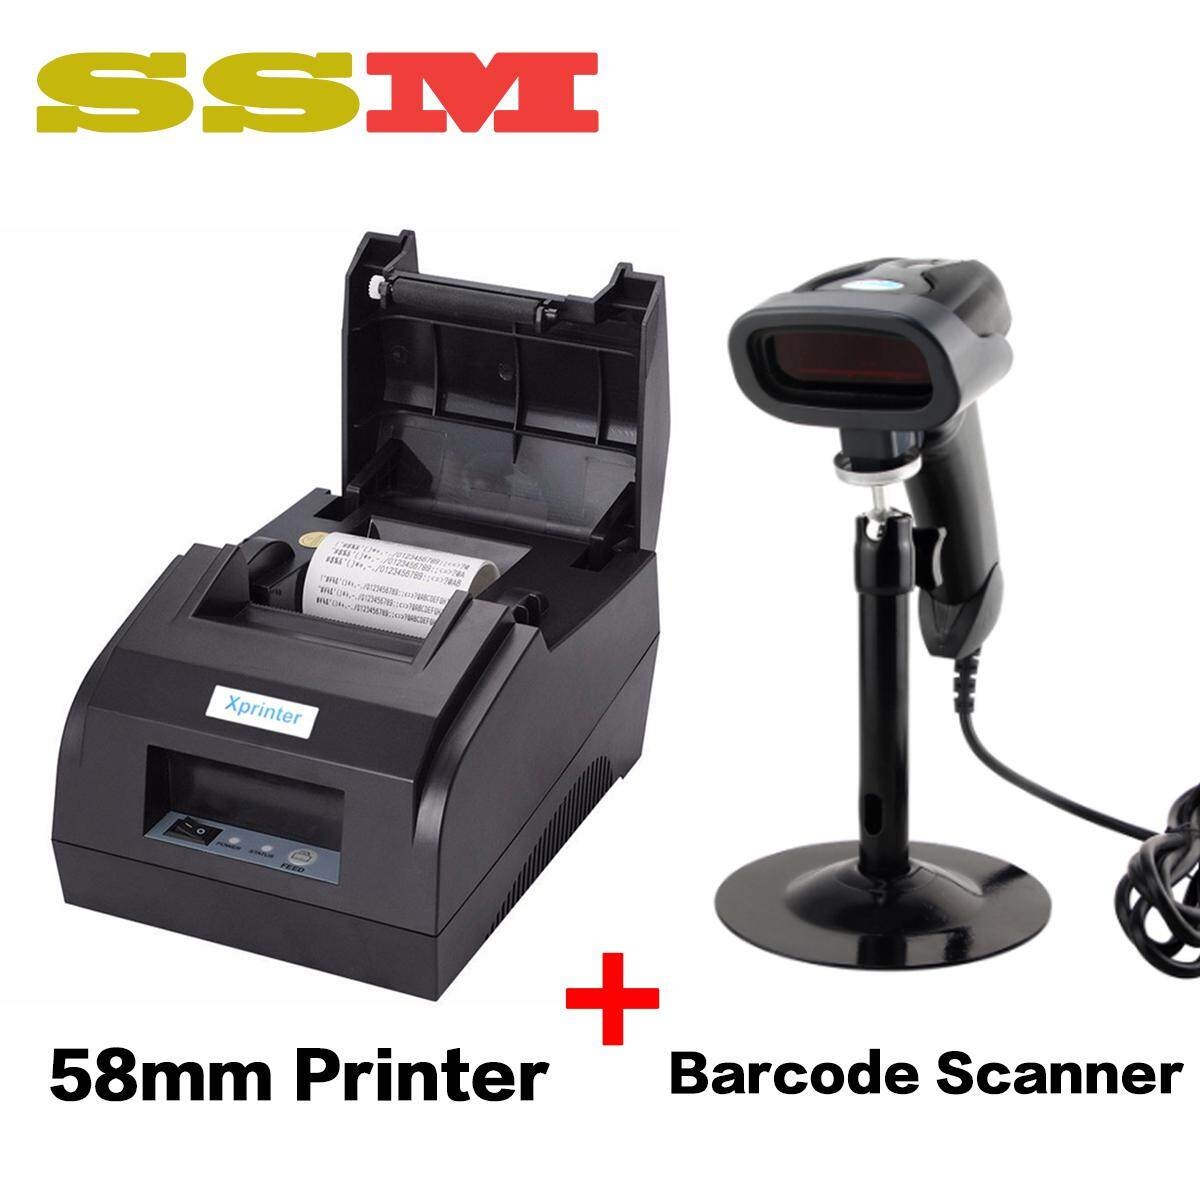 Features Datalogic Qw2120 1d Handheld Barcode Scanner Dan Harga Qw2100 Linear Imager Quickscan Lite Ssm 58mm Thermal Receipt Printer And Laser